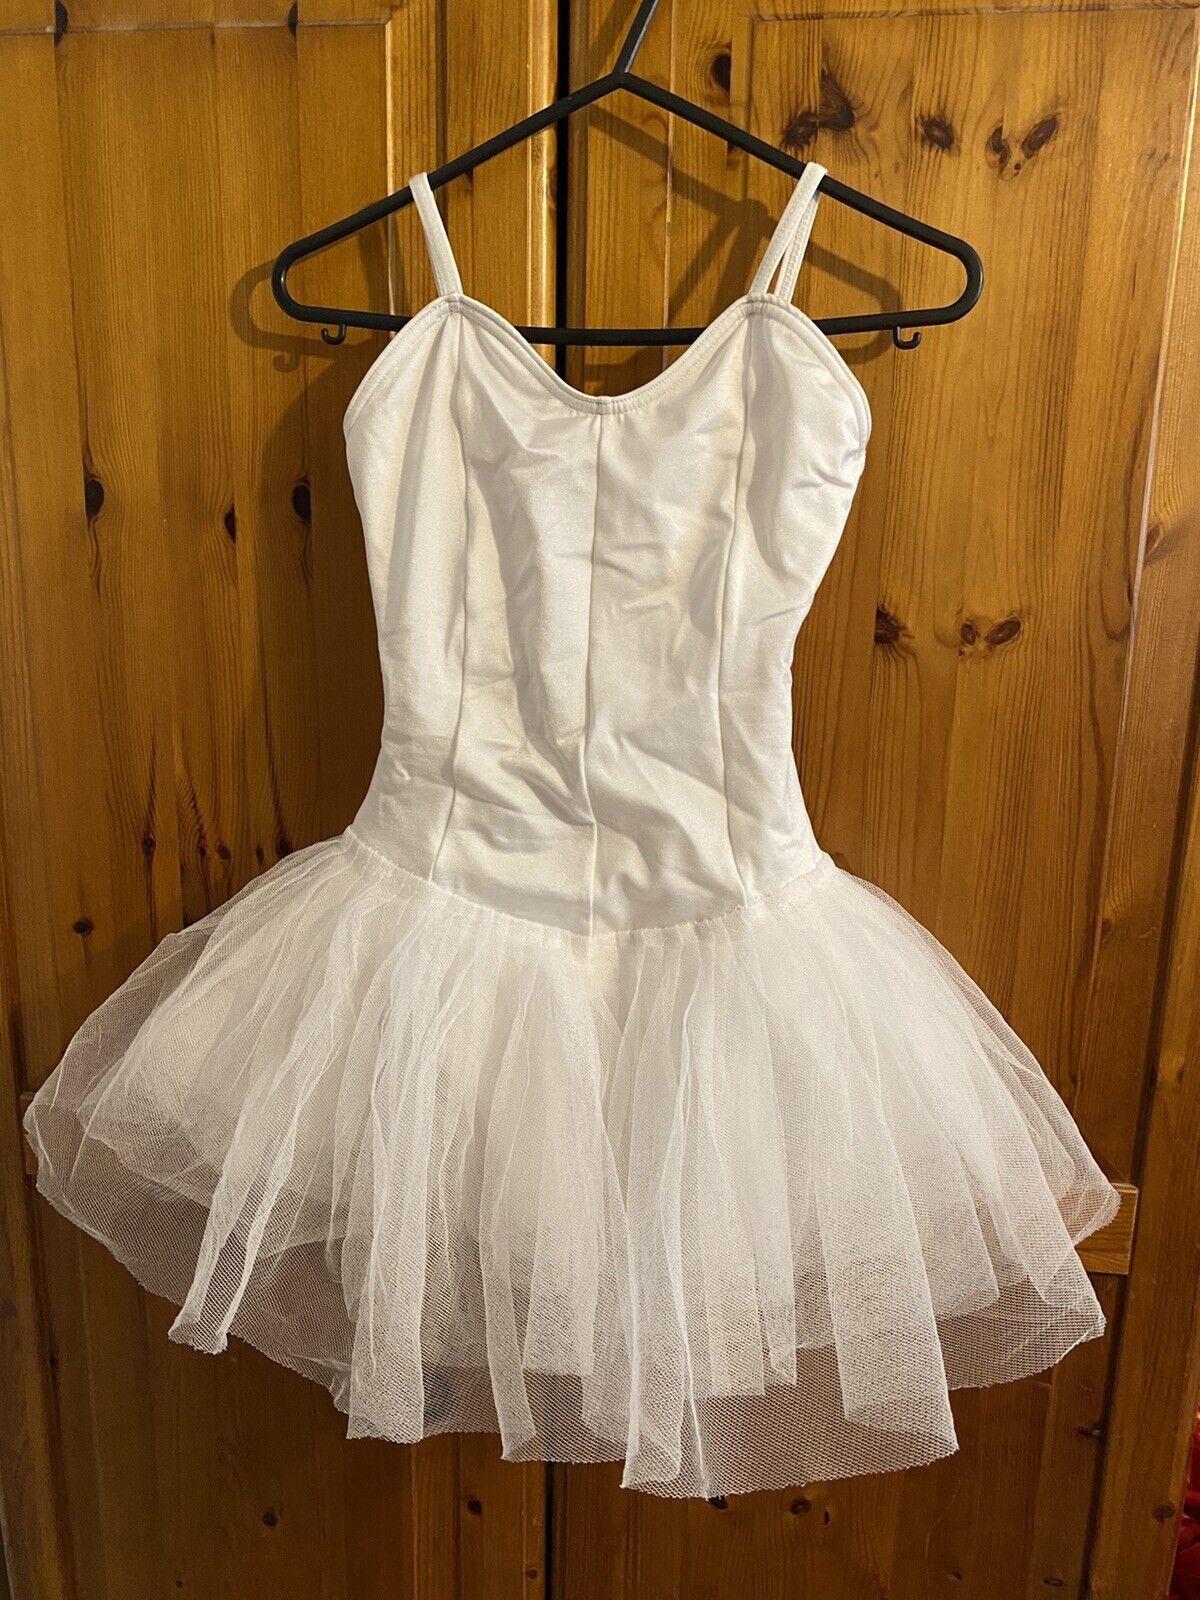 White Ballerina Tutu Leotard Size 3A